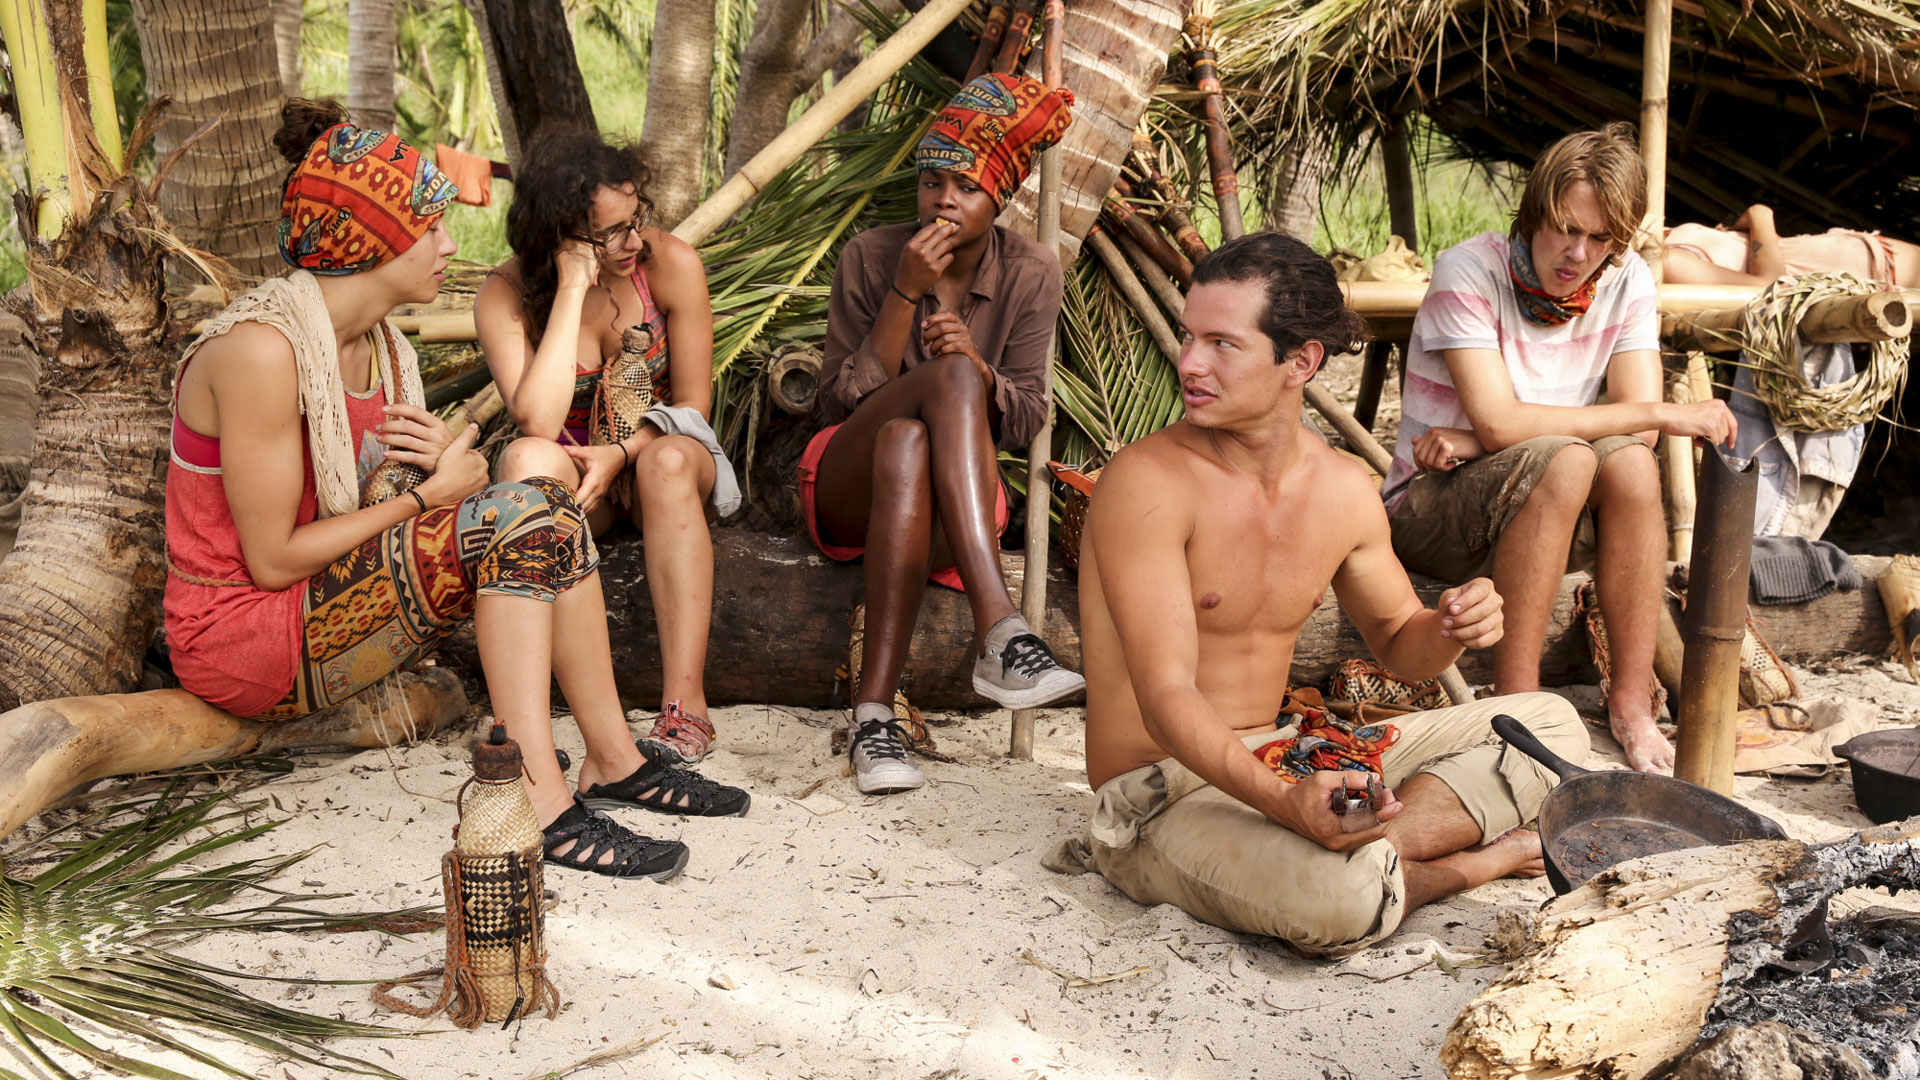 A group of Millennials have a conversation at camp.